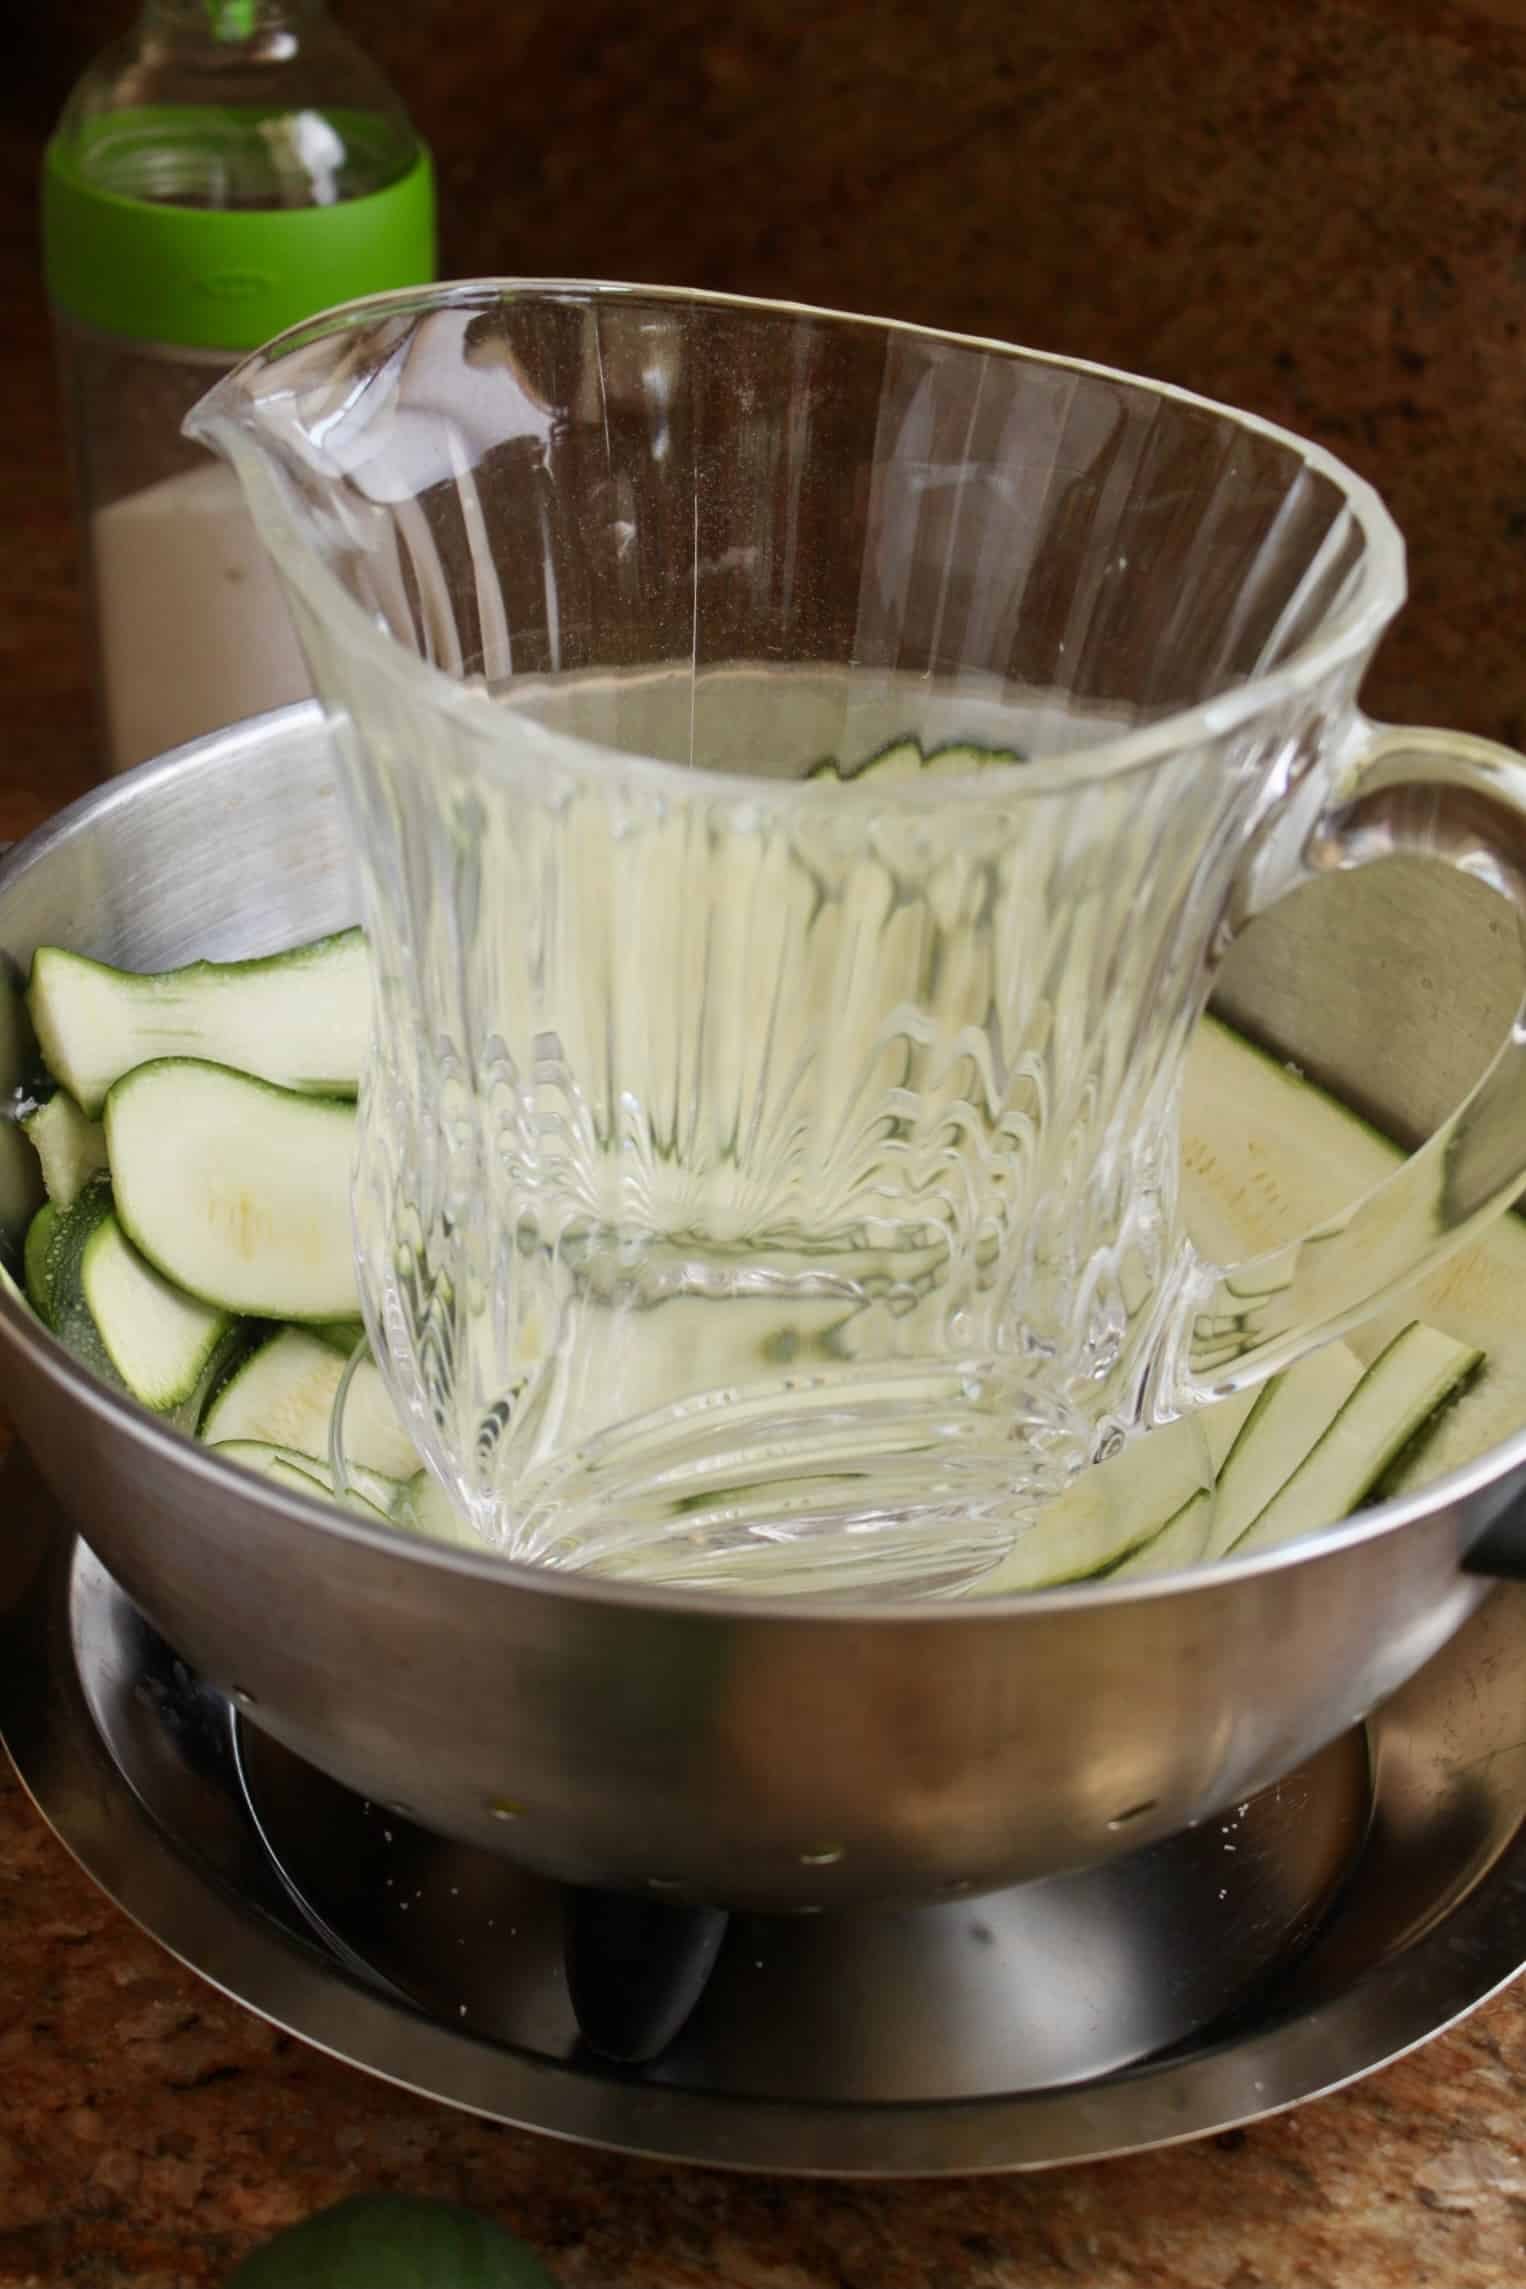 jug on zucchini slices